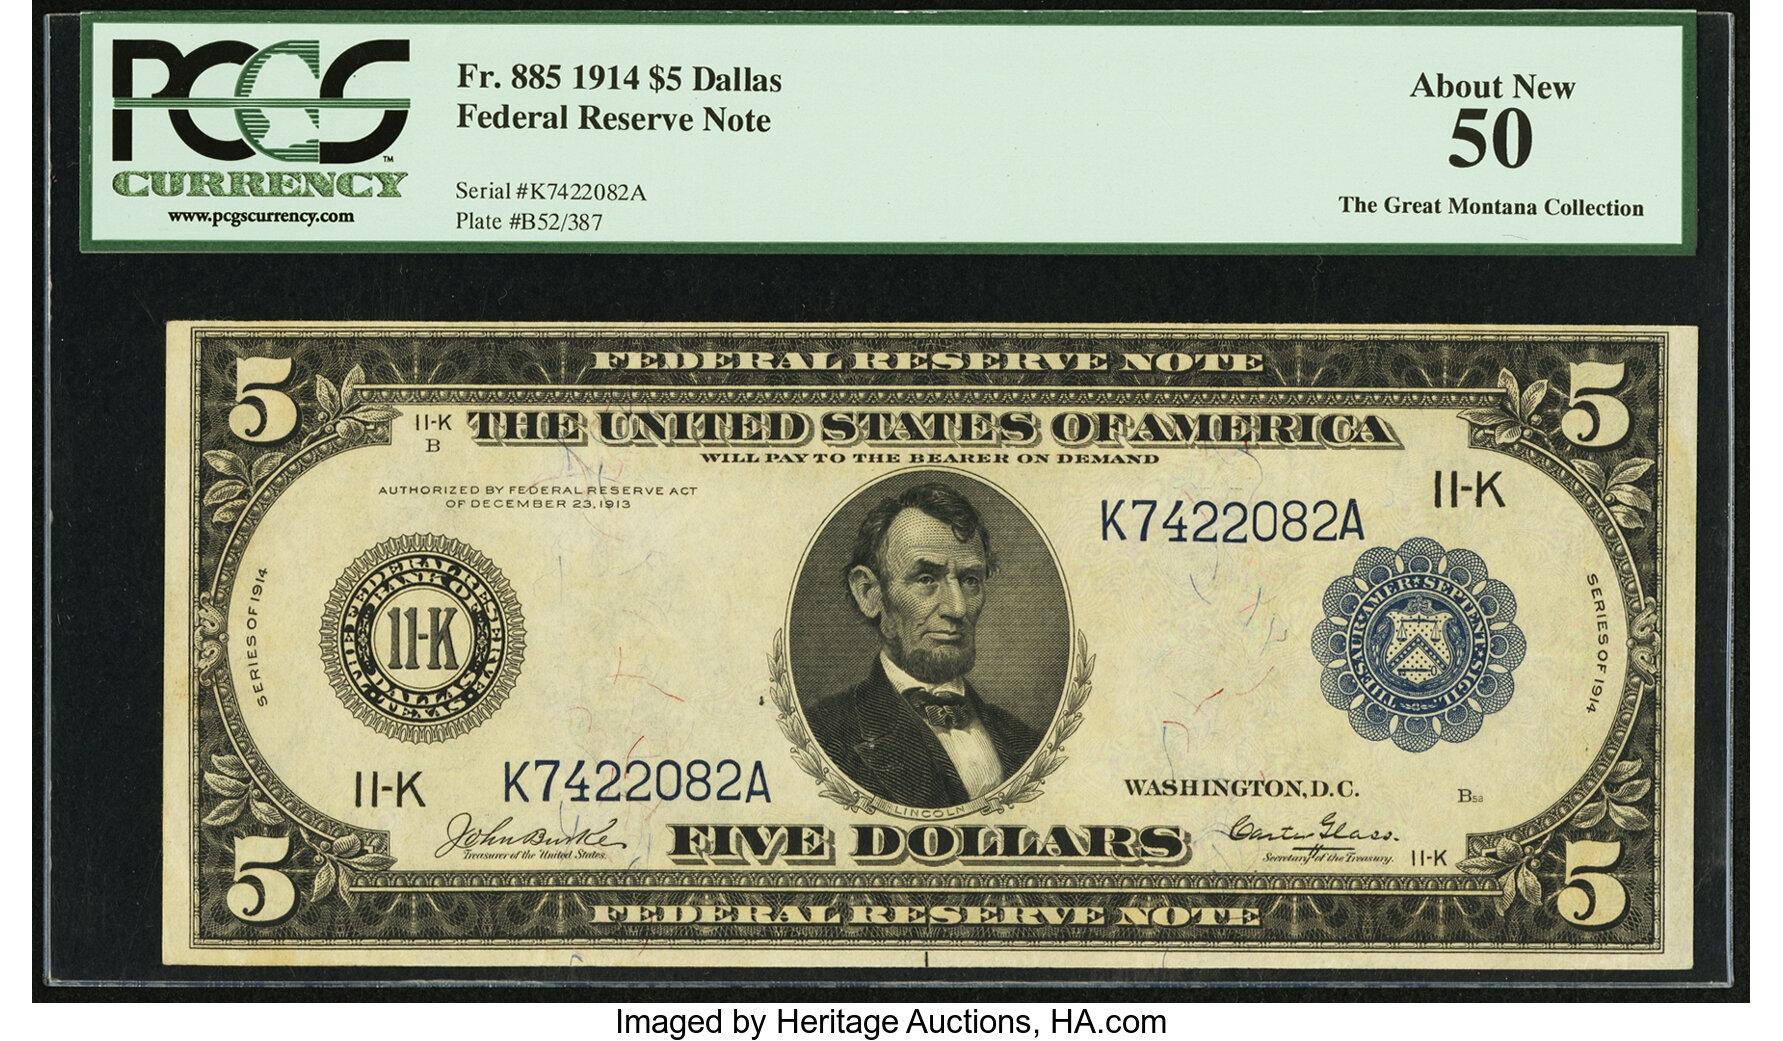 sample image for Fr.885 $5 Dallas